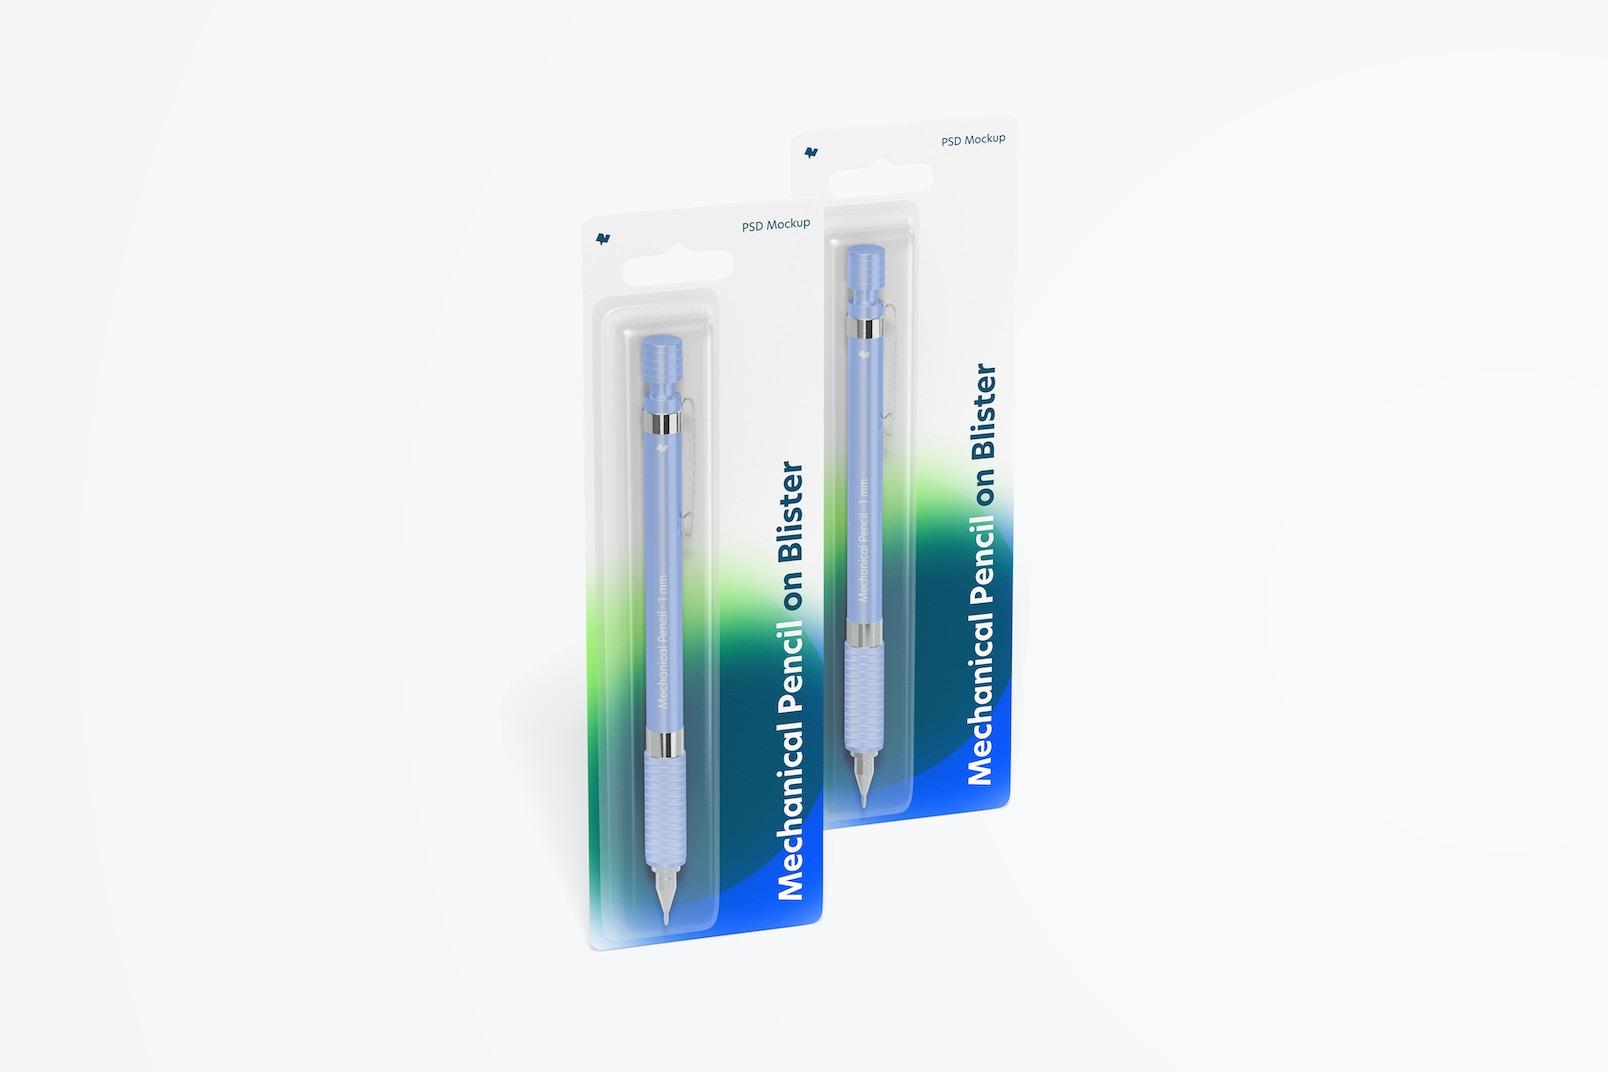 Mechanical Pencils on Blisters Mockup